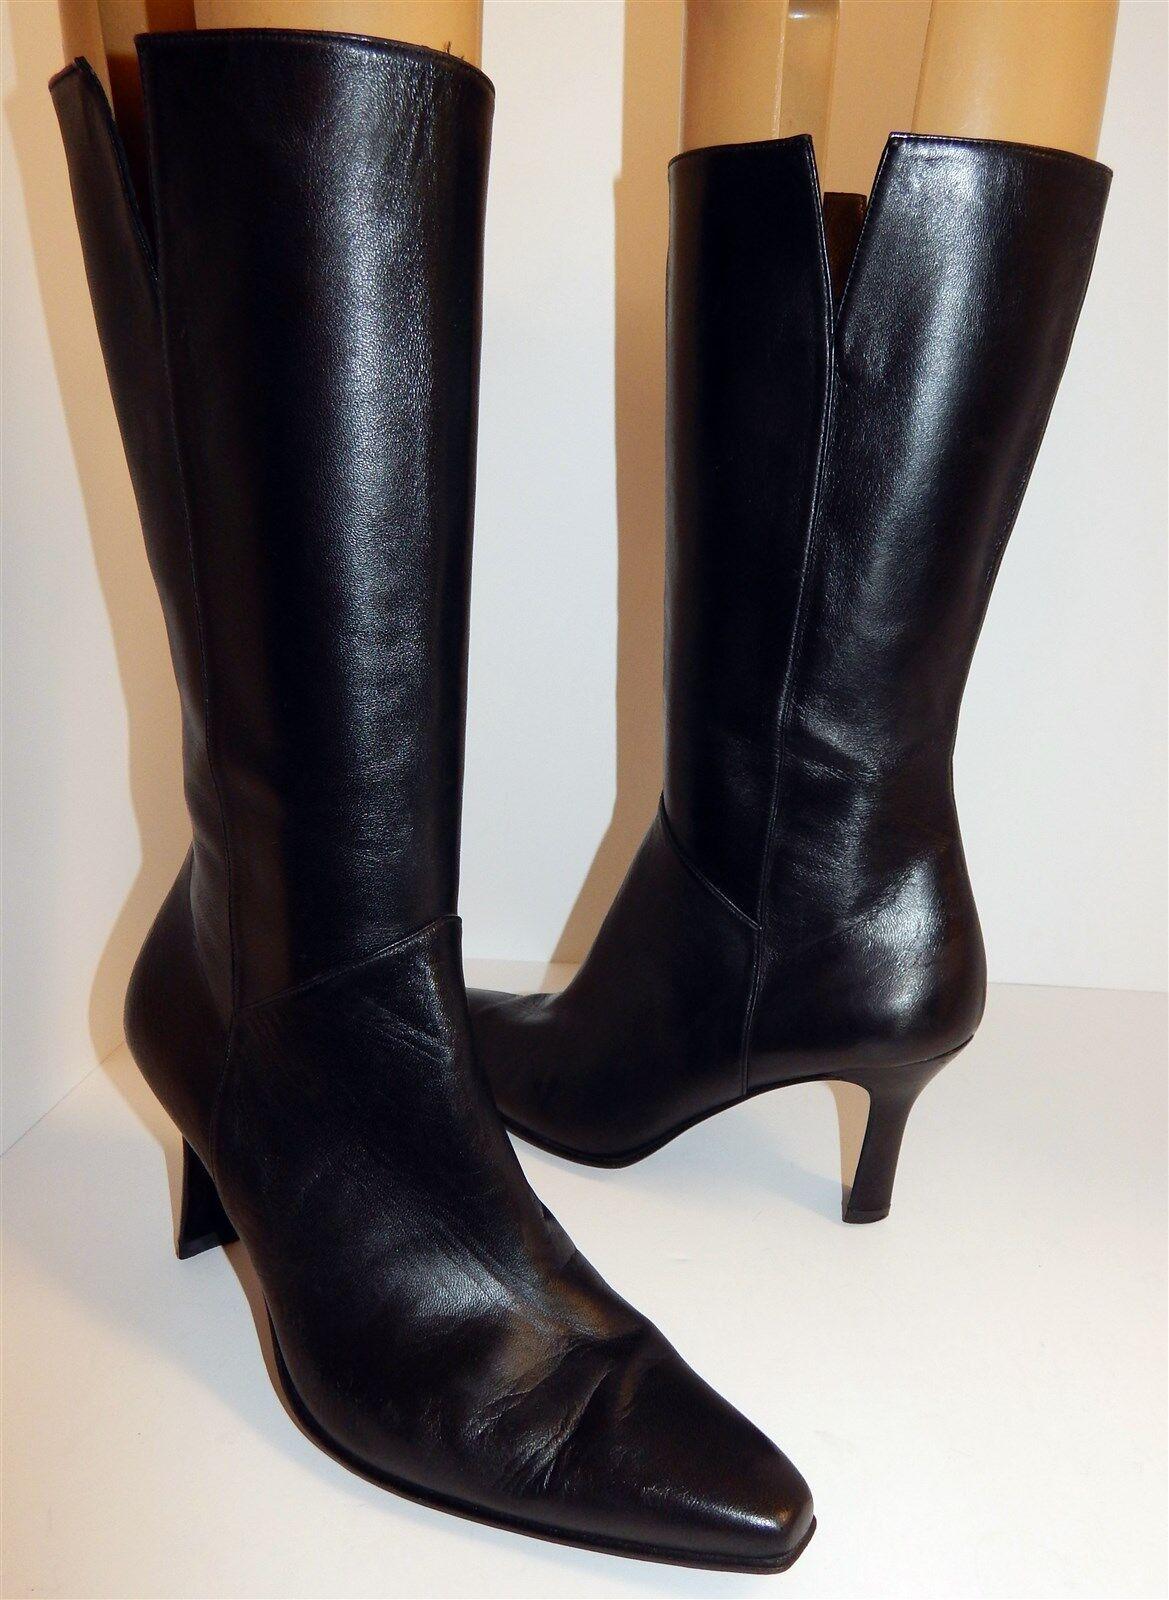 Stuart Weitzman Black Black Black Leather Zip Fashion Boots 7.5 M 200569